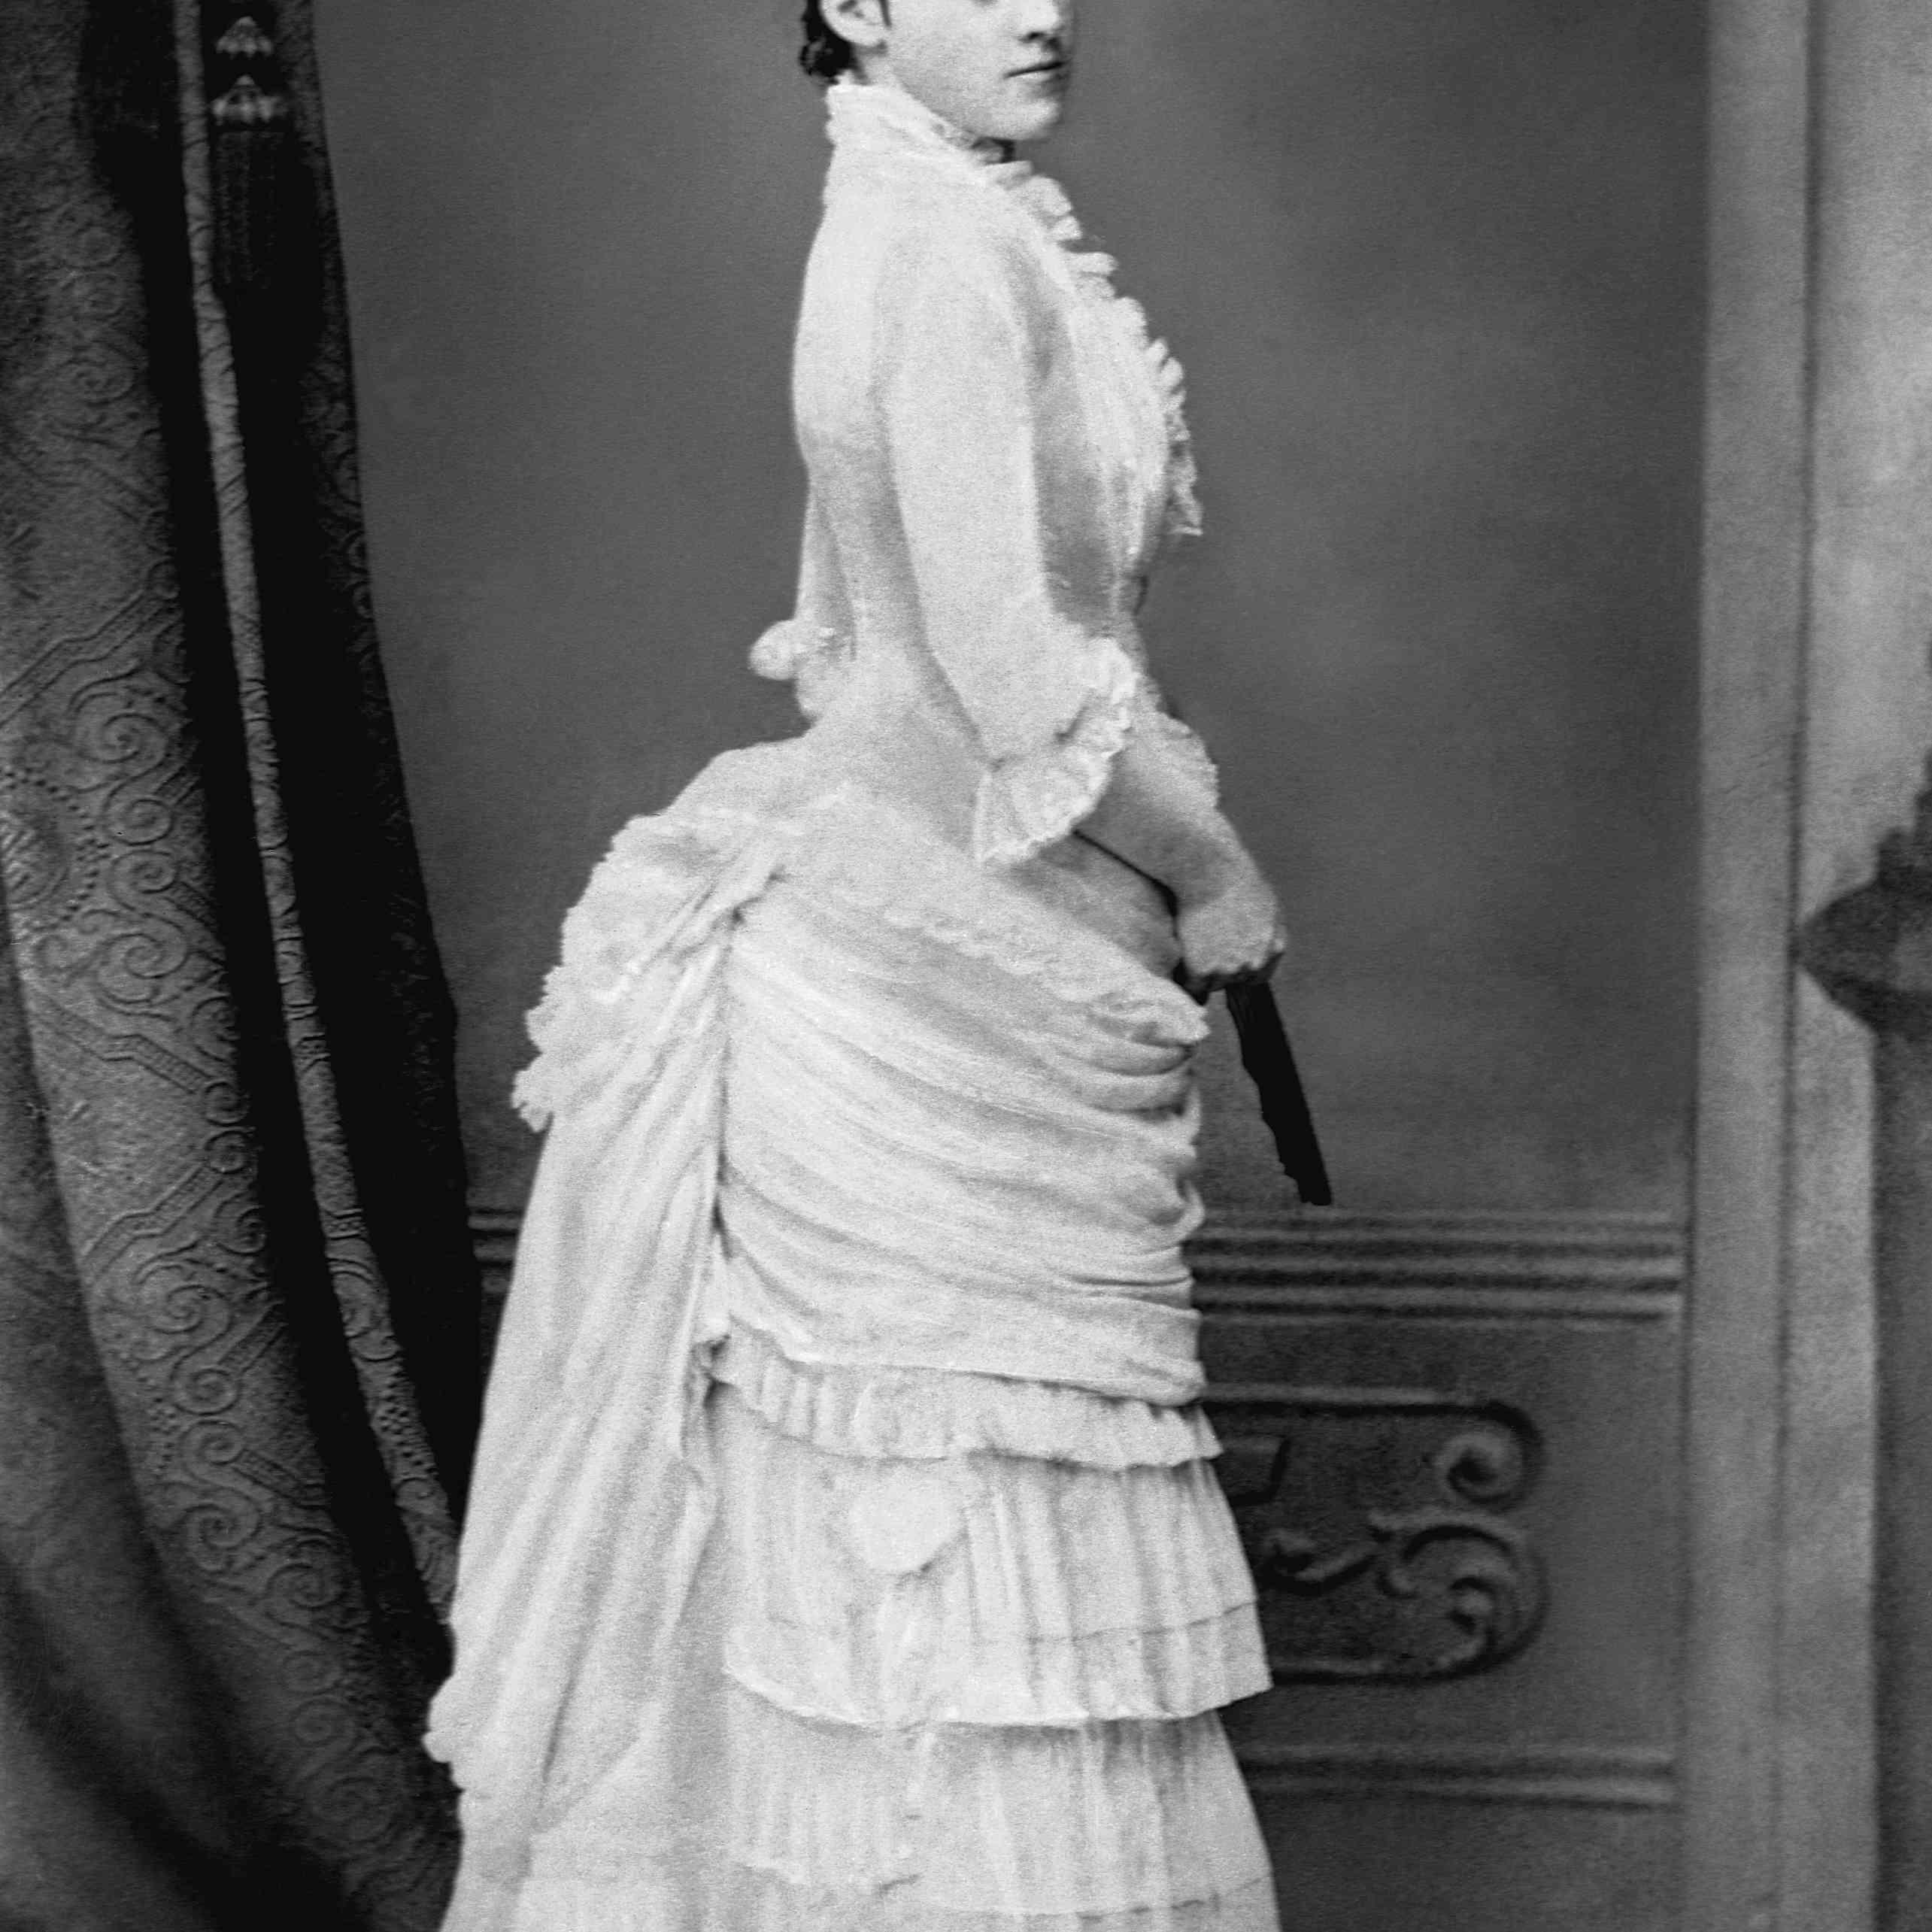 Edith Wharton, American Novelist